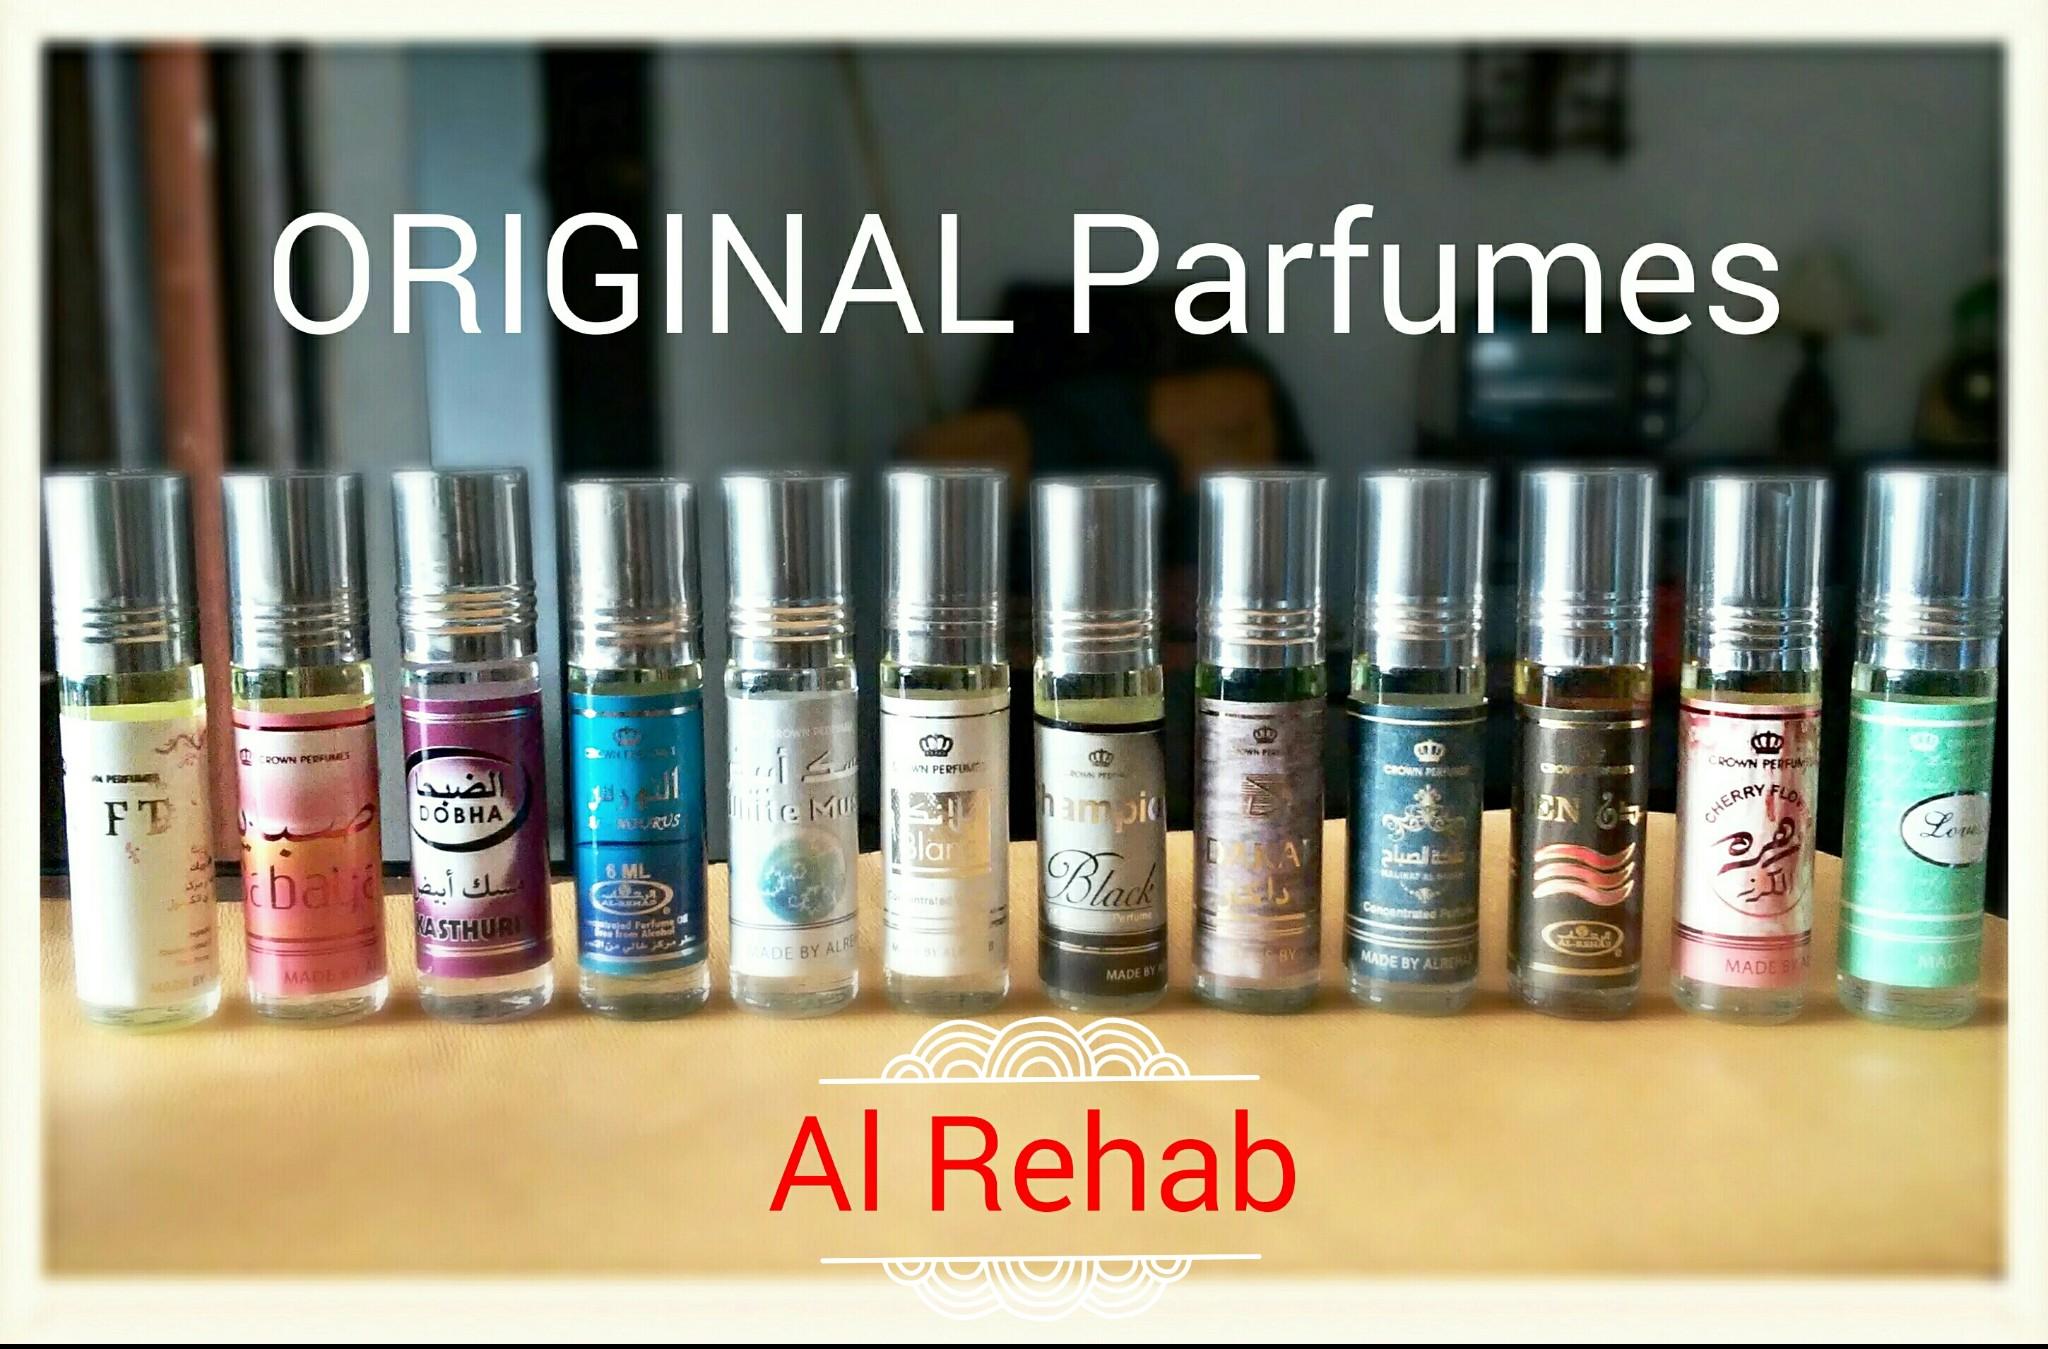 Jual Parfume Al Rehab Dan Dobha Original Non Alkohol 6 Ml Roll On Parfum Soft Arab Tokopedia